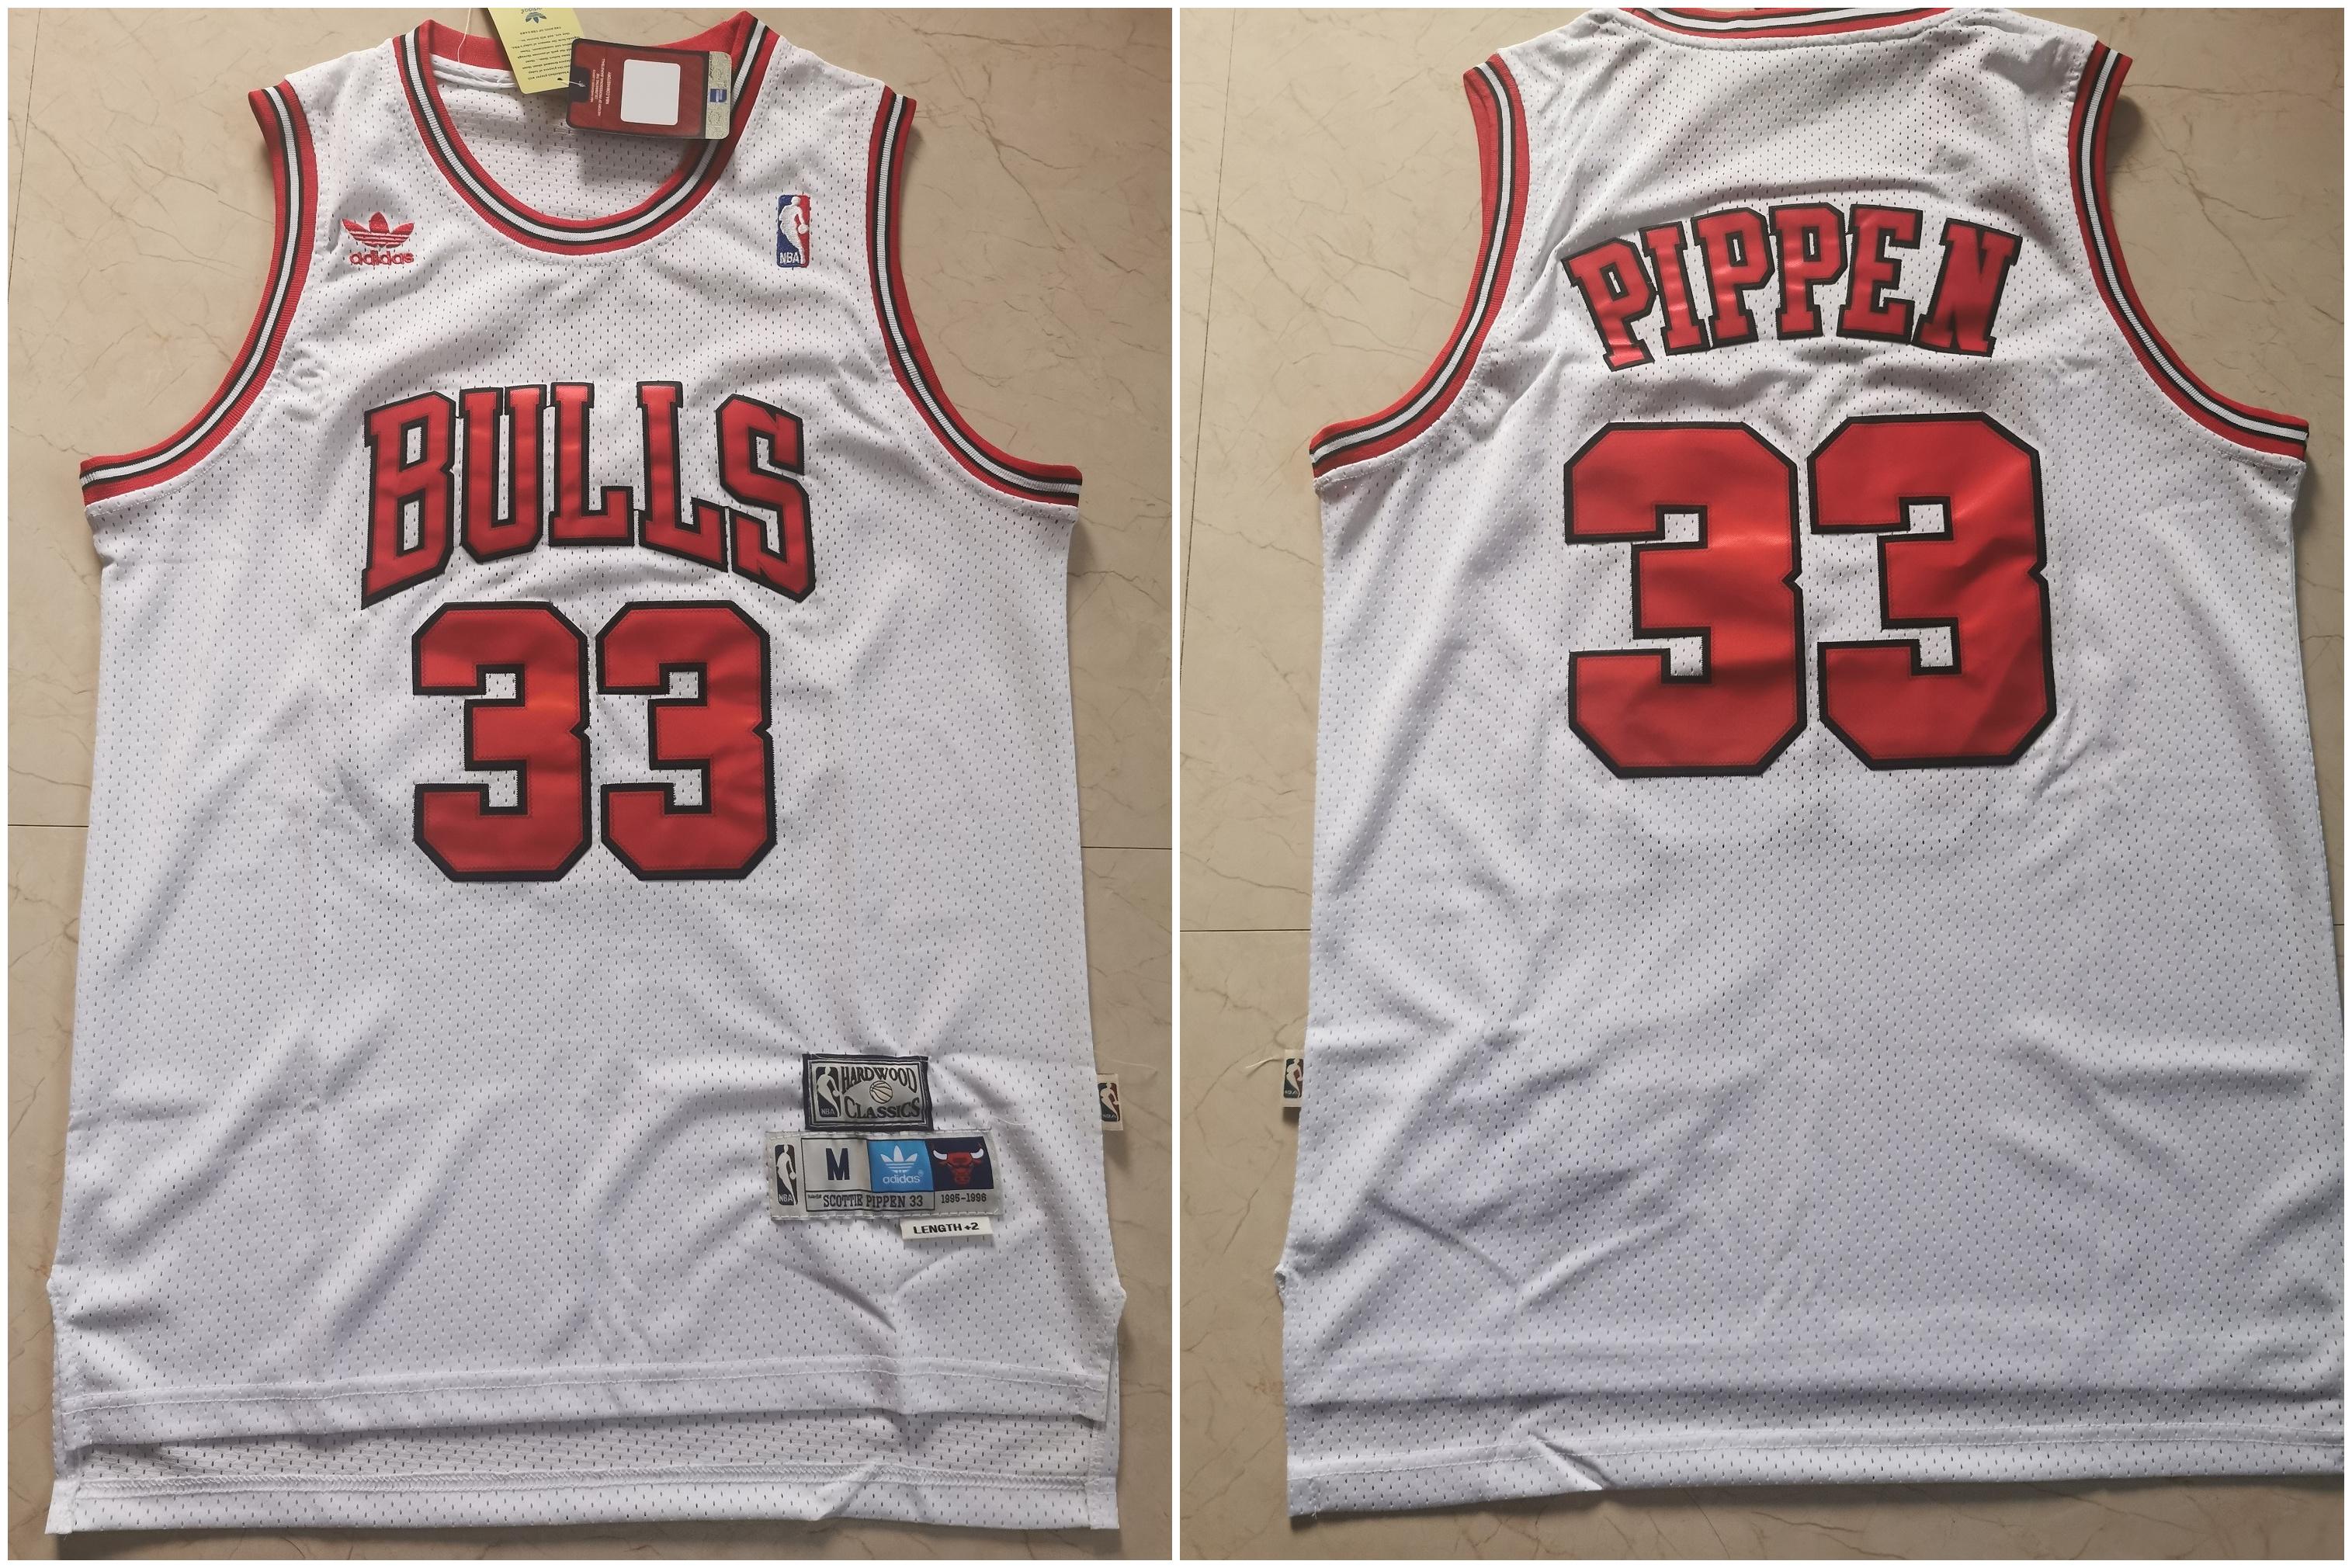 Bulls 33 Scottie Pippen White Hardwood Classics Jersey